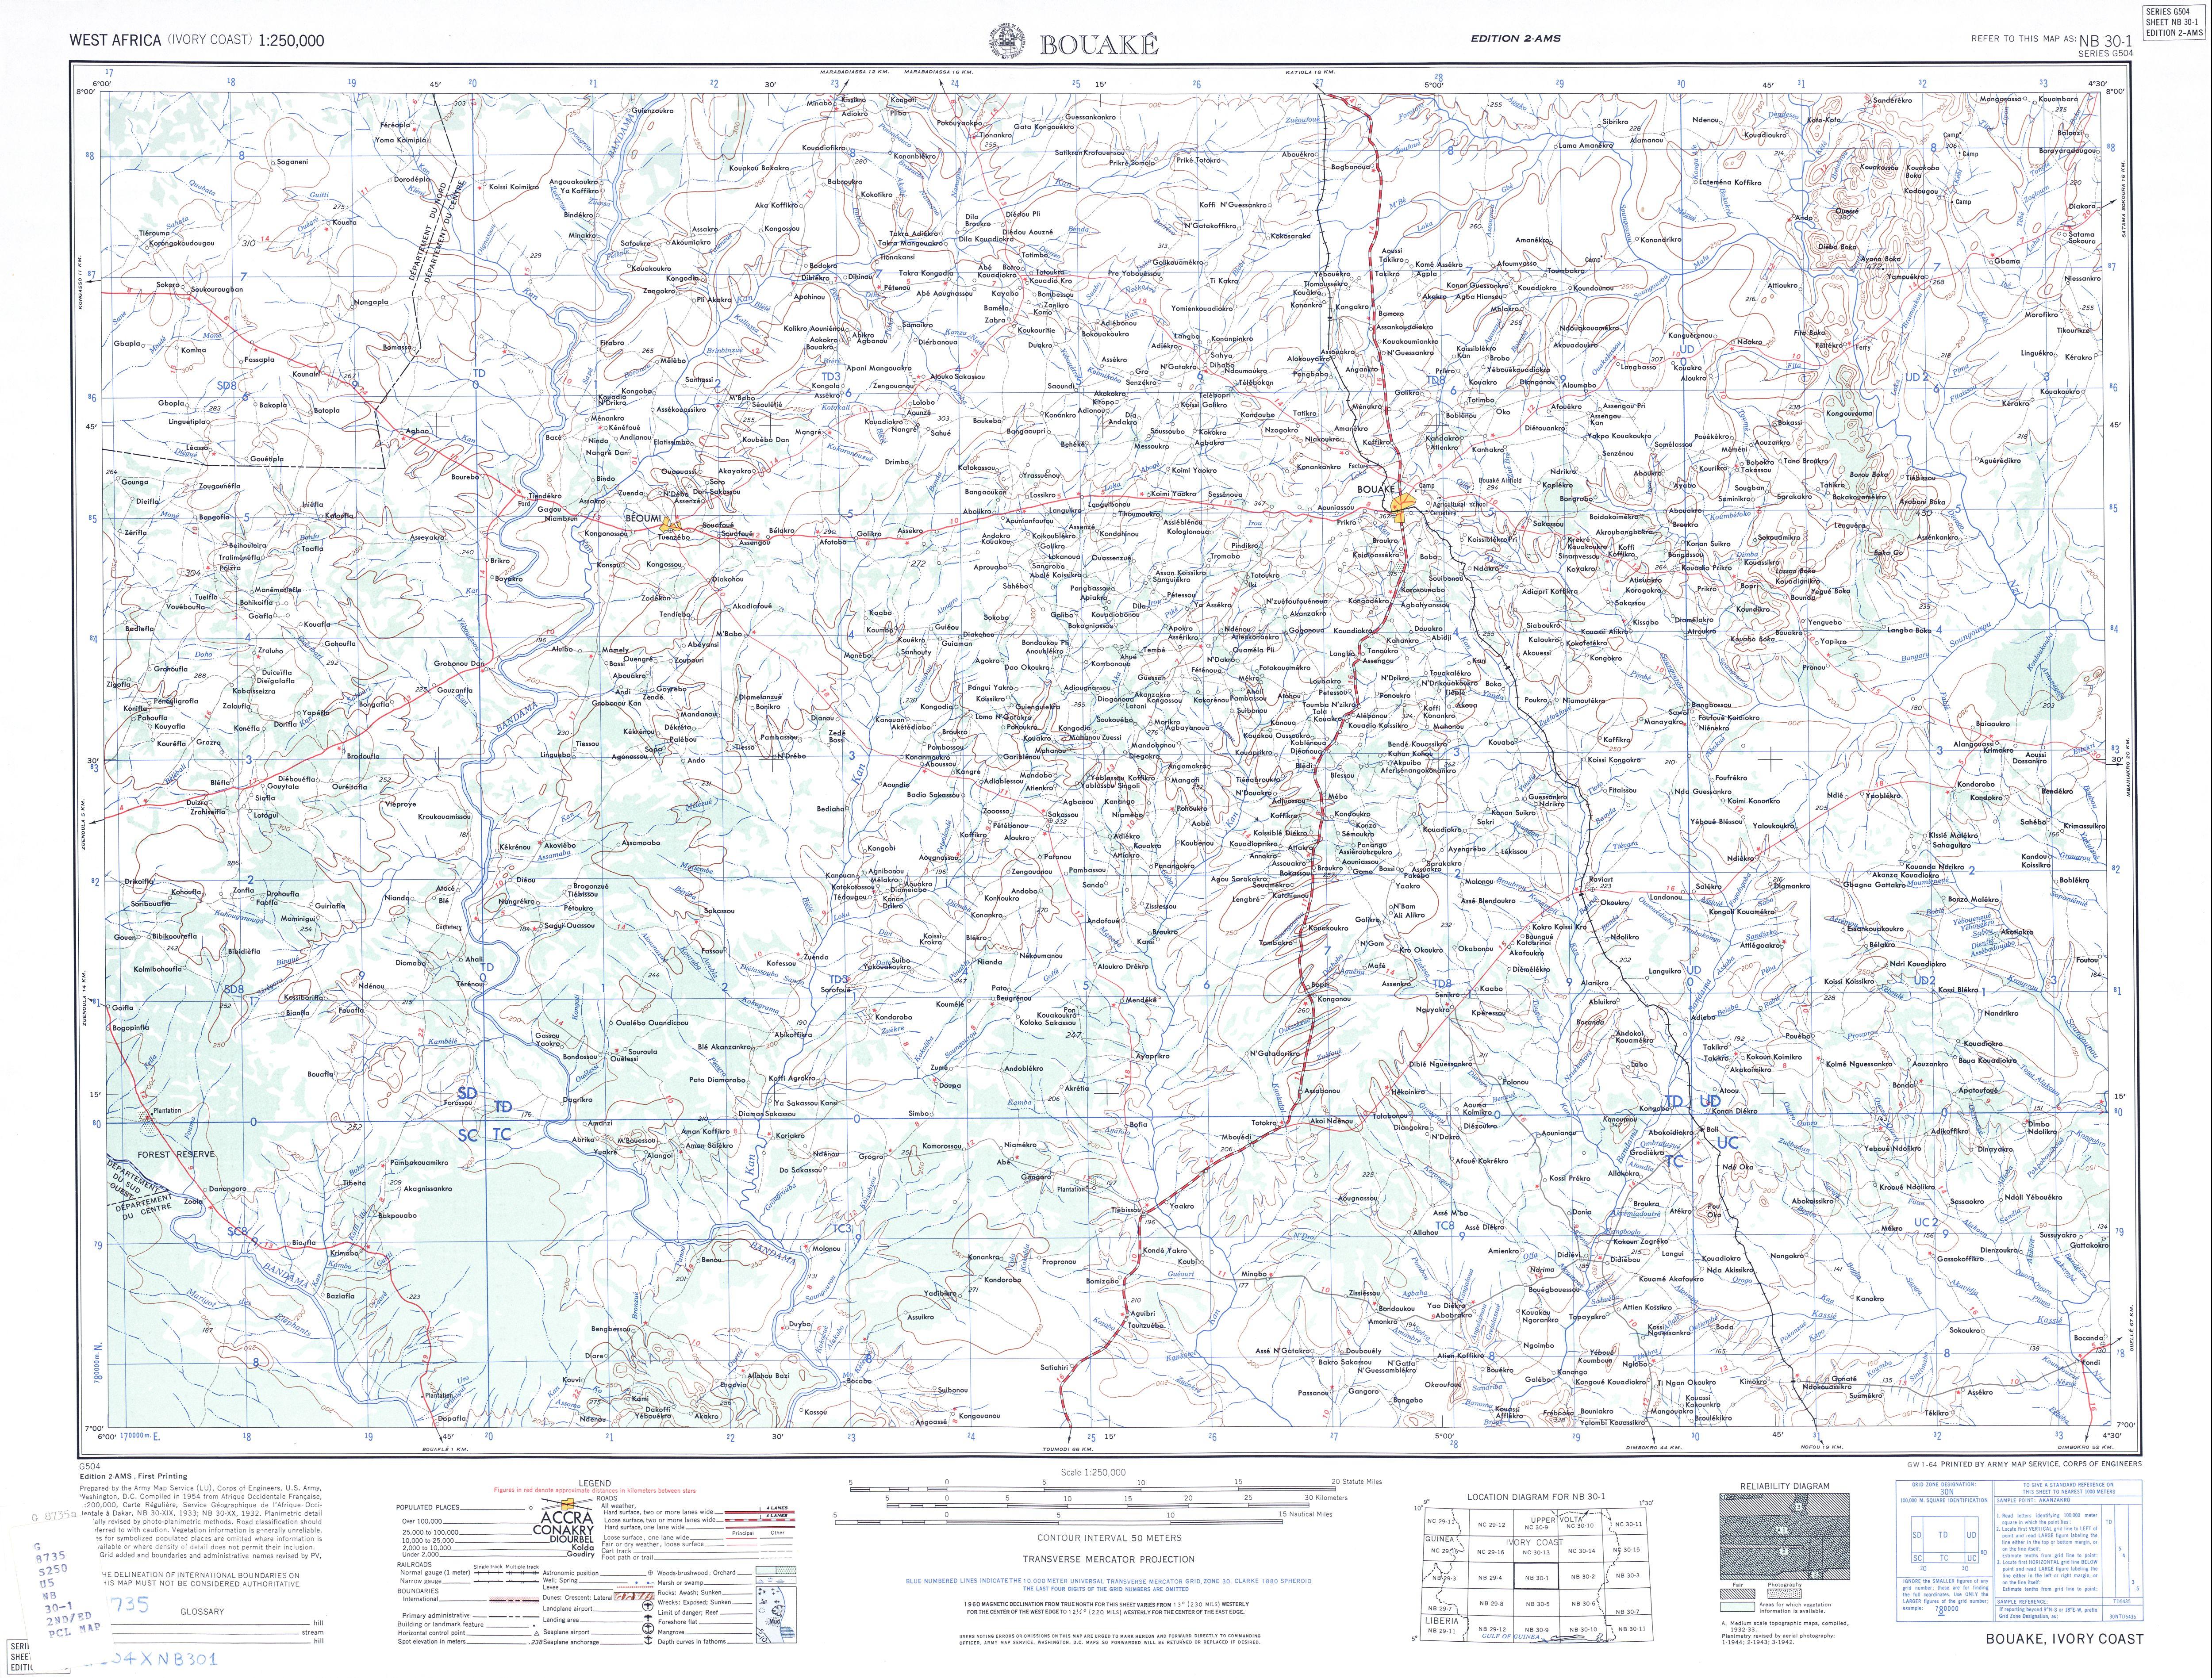 Bouake Topographic Map Sheet, Western Africa 1955